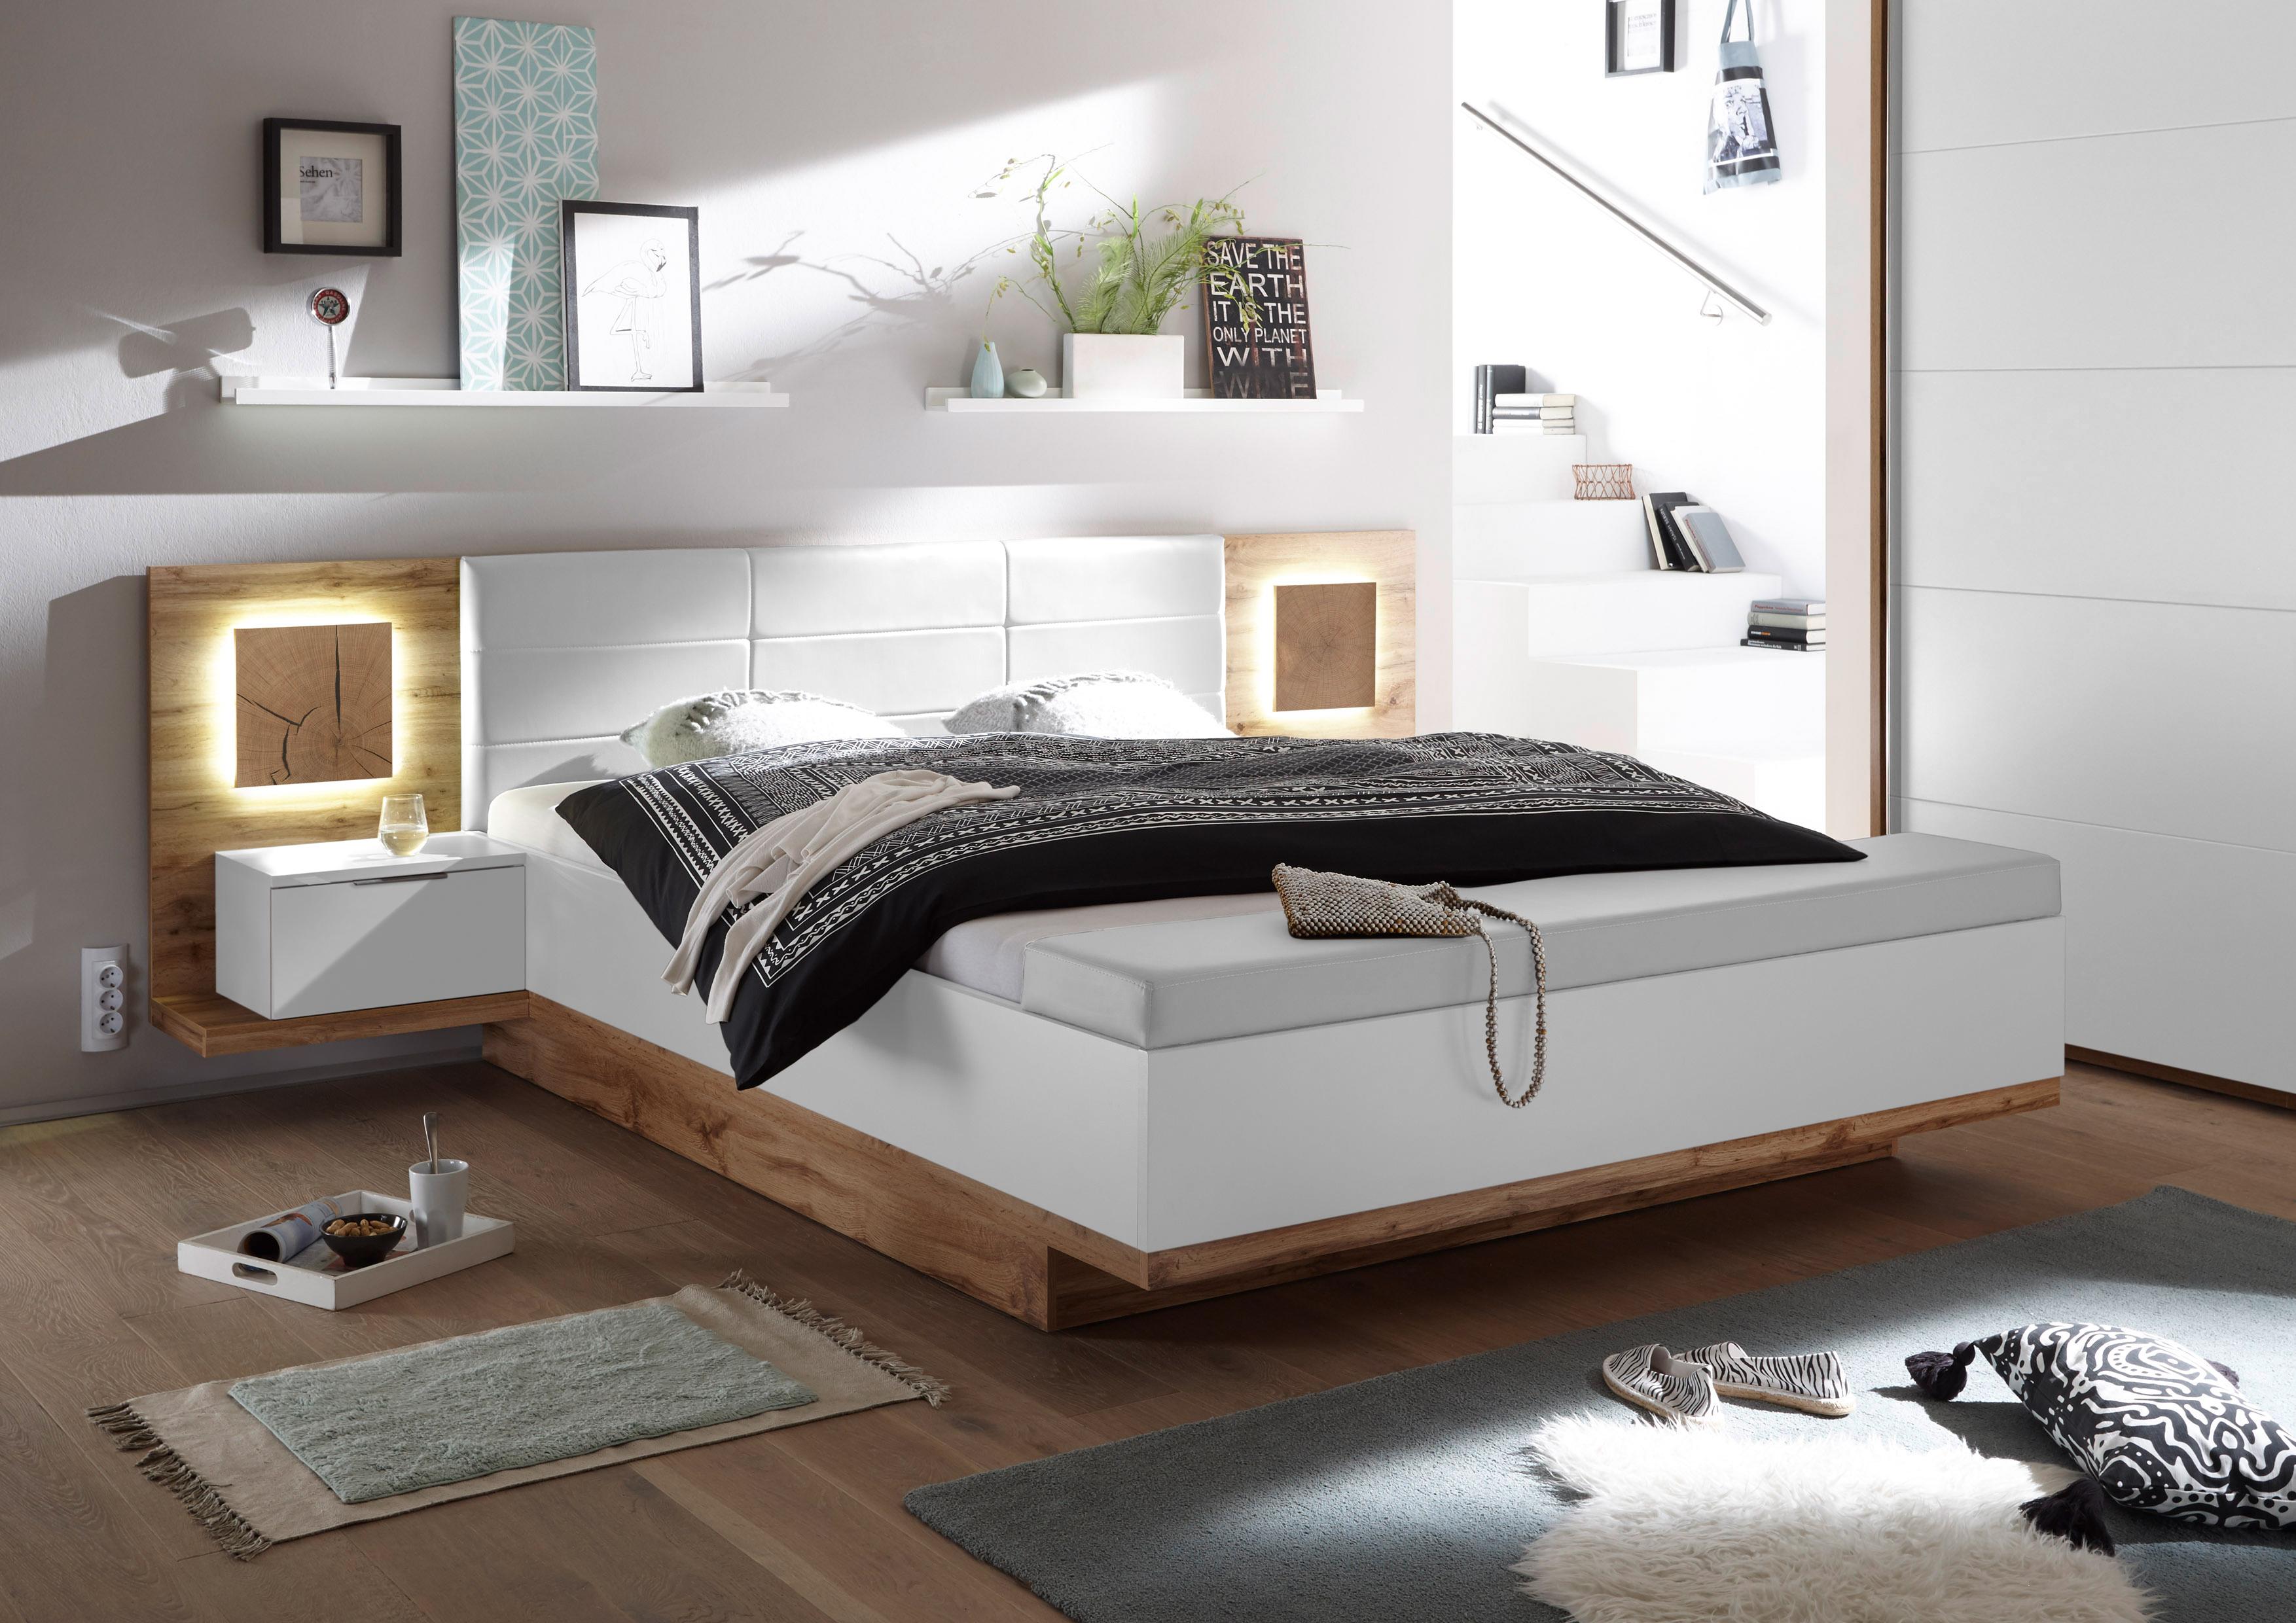 Details Zu Doppelbett Nachtkommoden Capri Xl Bett Ehebett Fussbank 180x200 Weiss Eiche